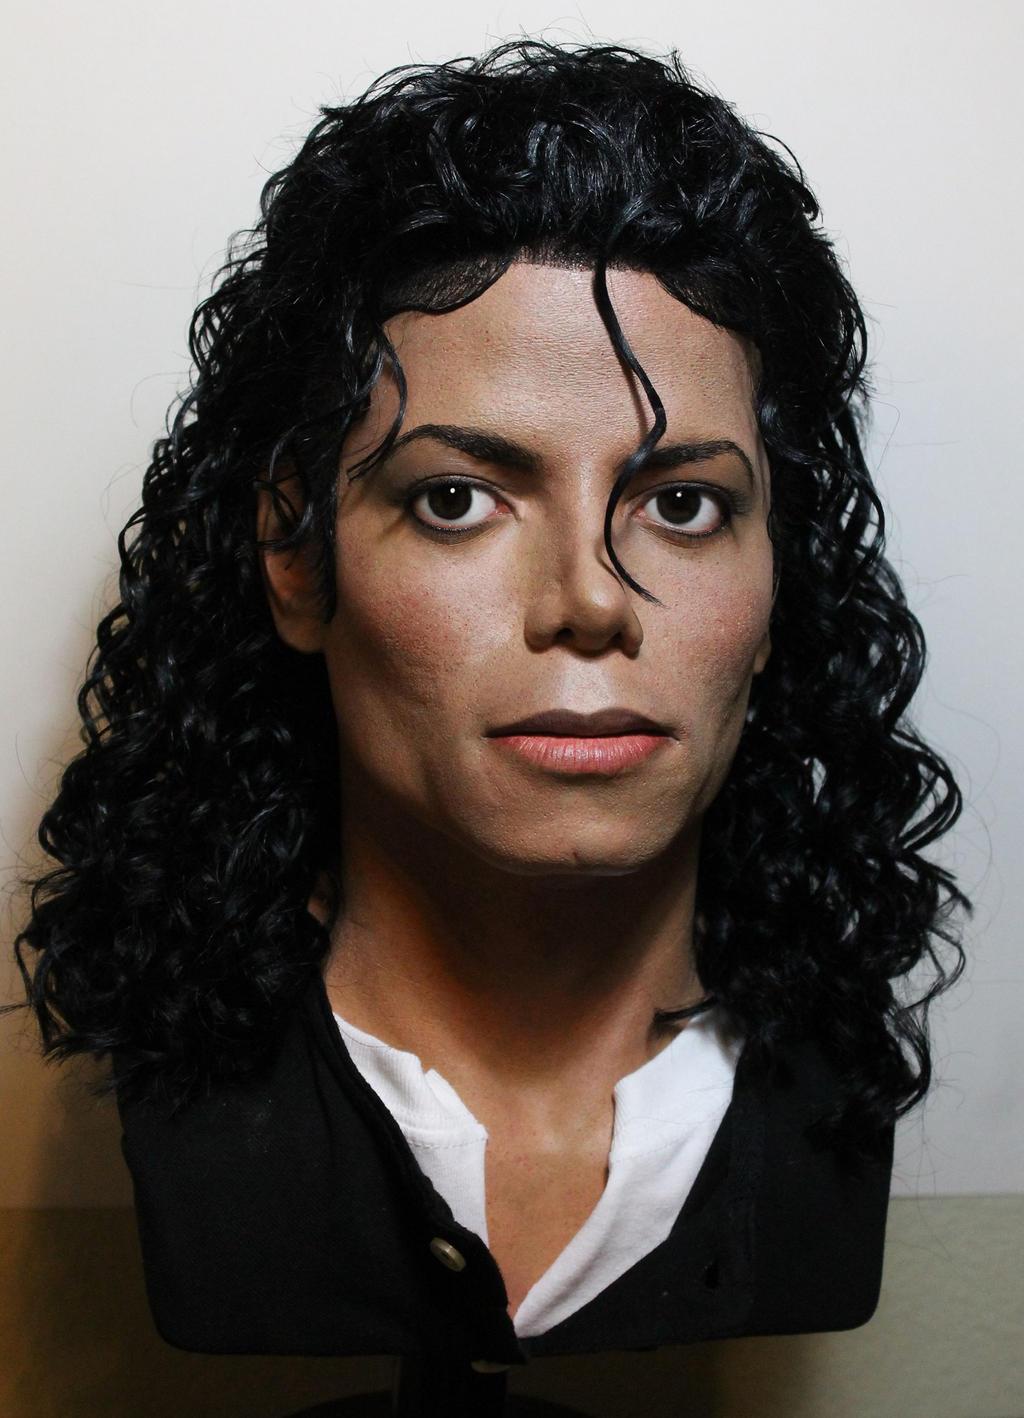 Michael Jackson Lifesize Bad Era Moonwalker Bust By Godaiking On Deviantart